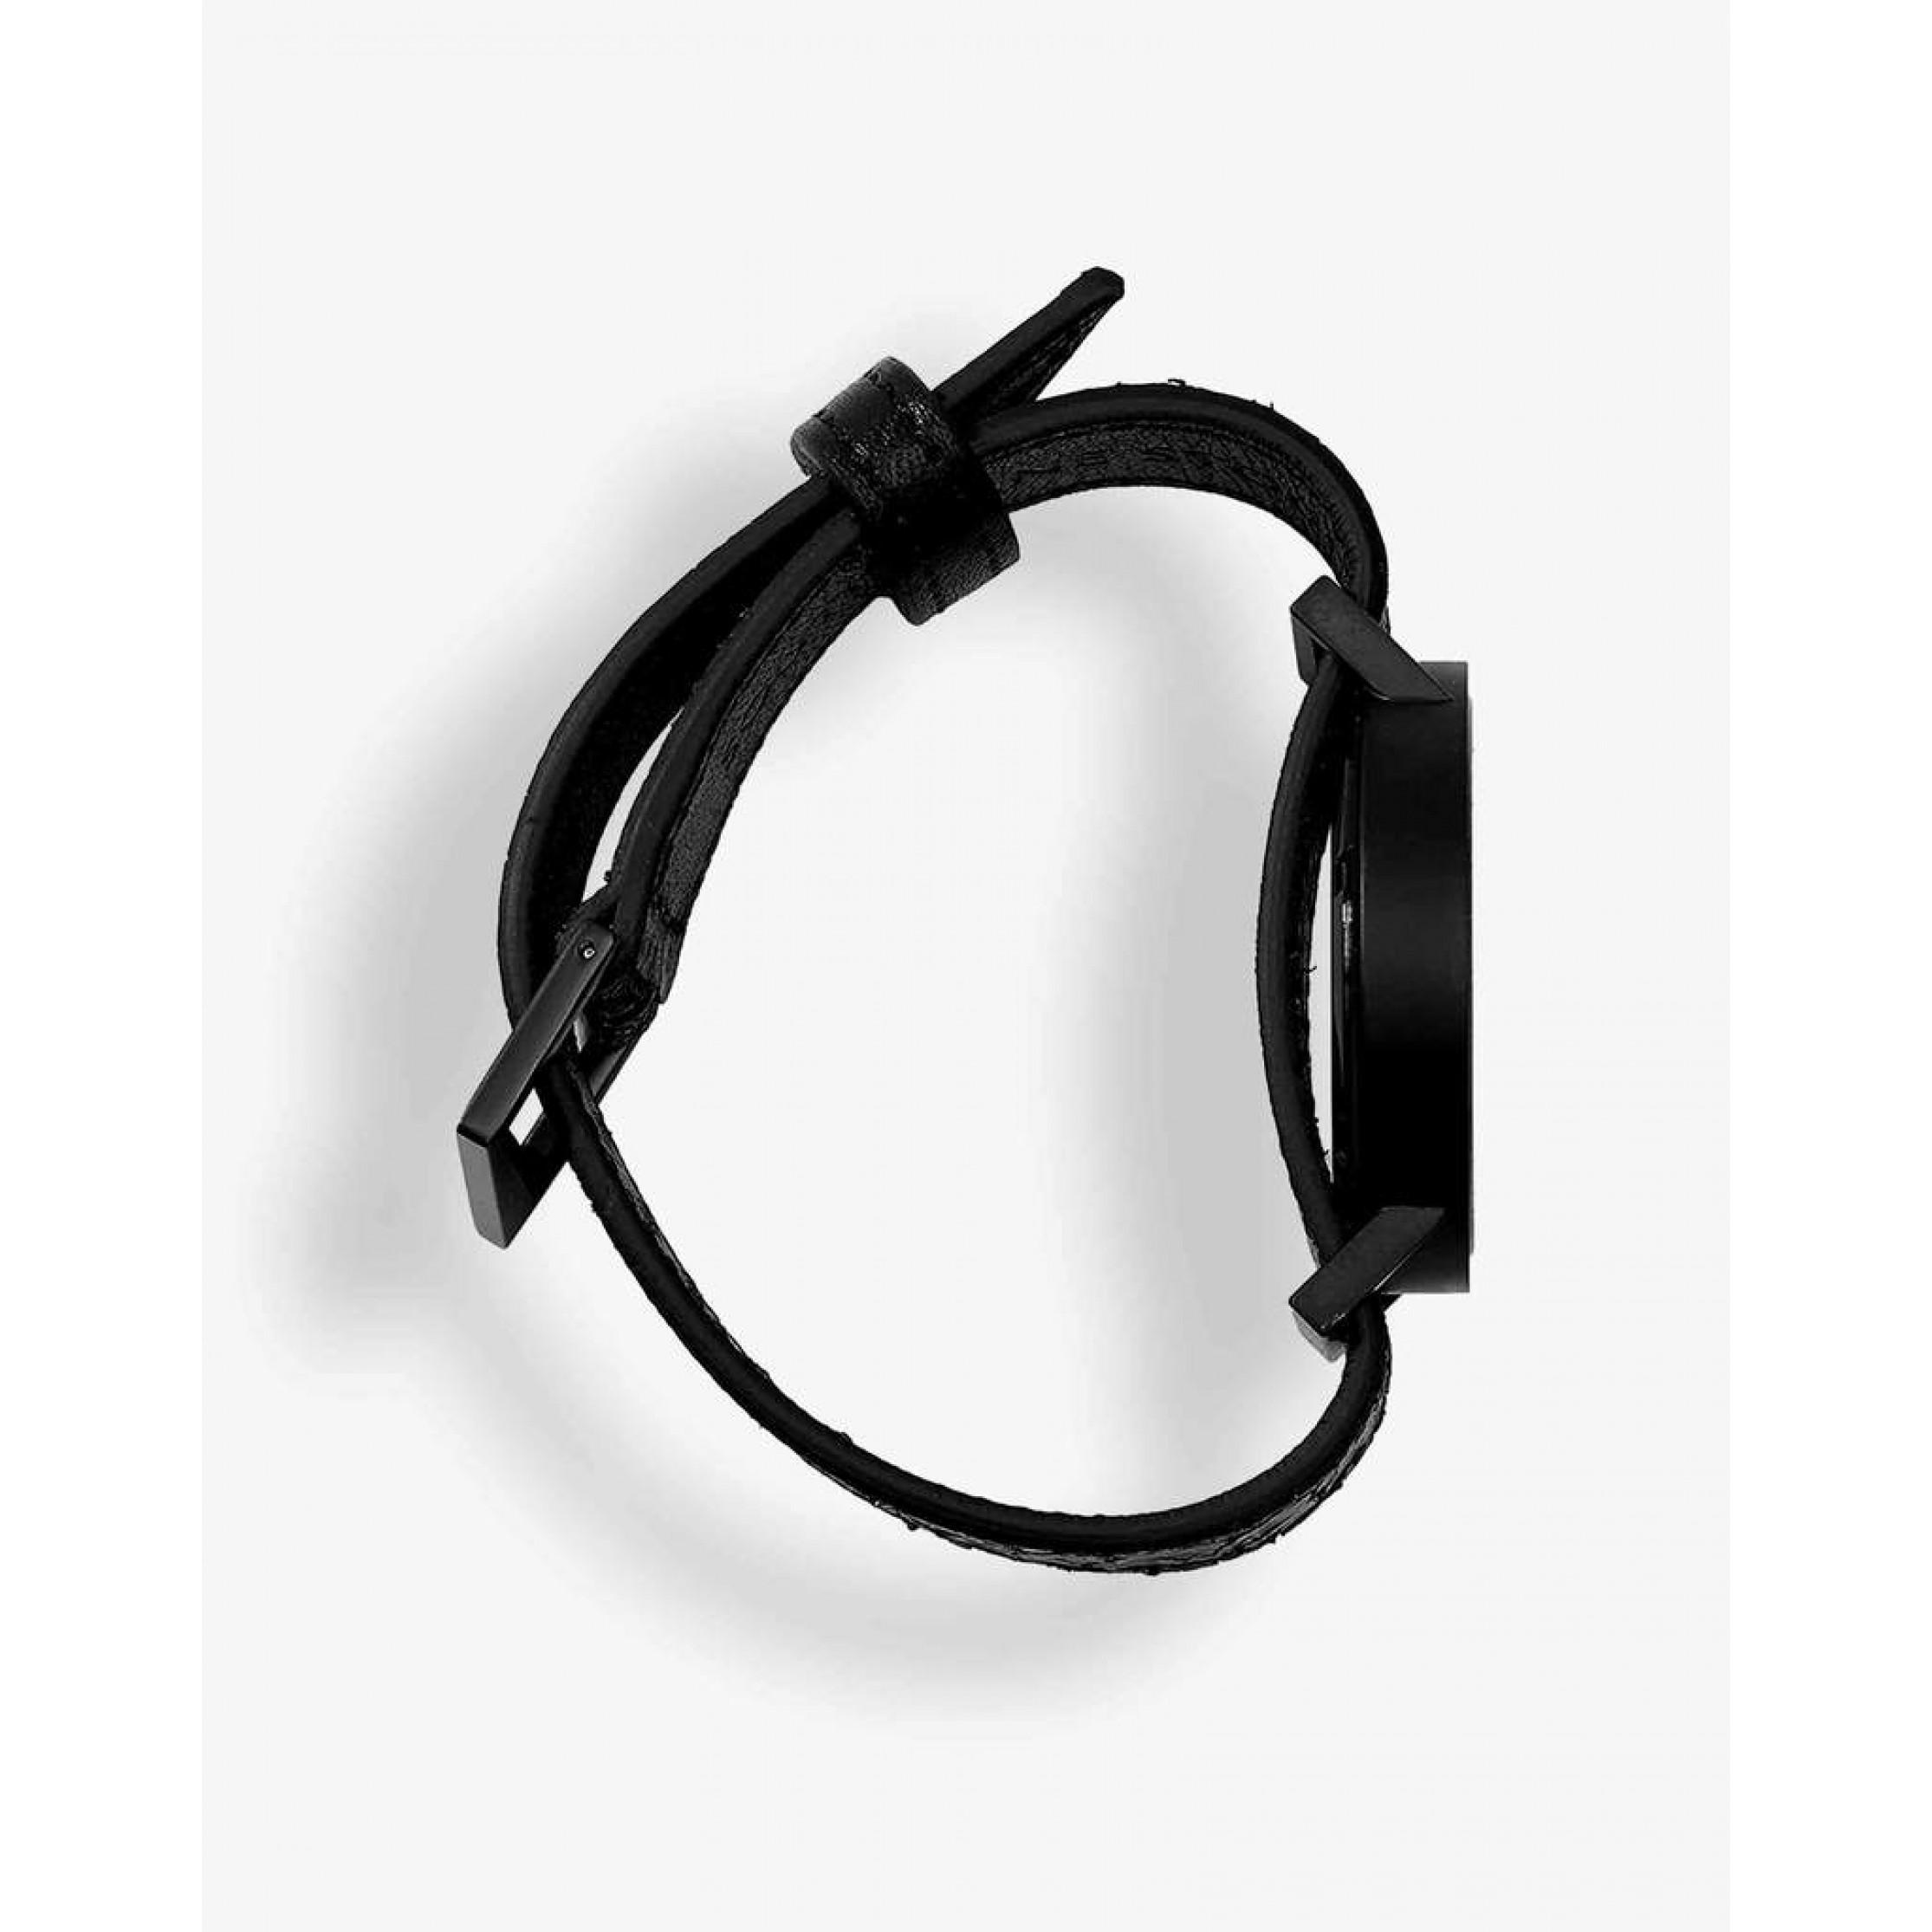 Avant Diffuse Watch | Black & White